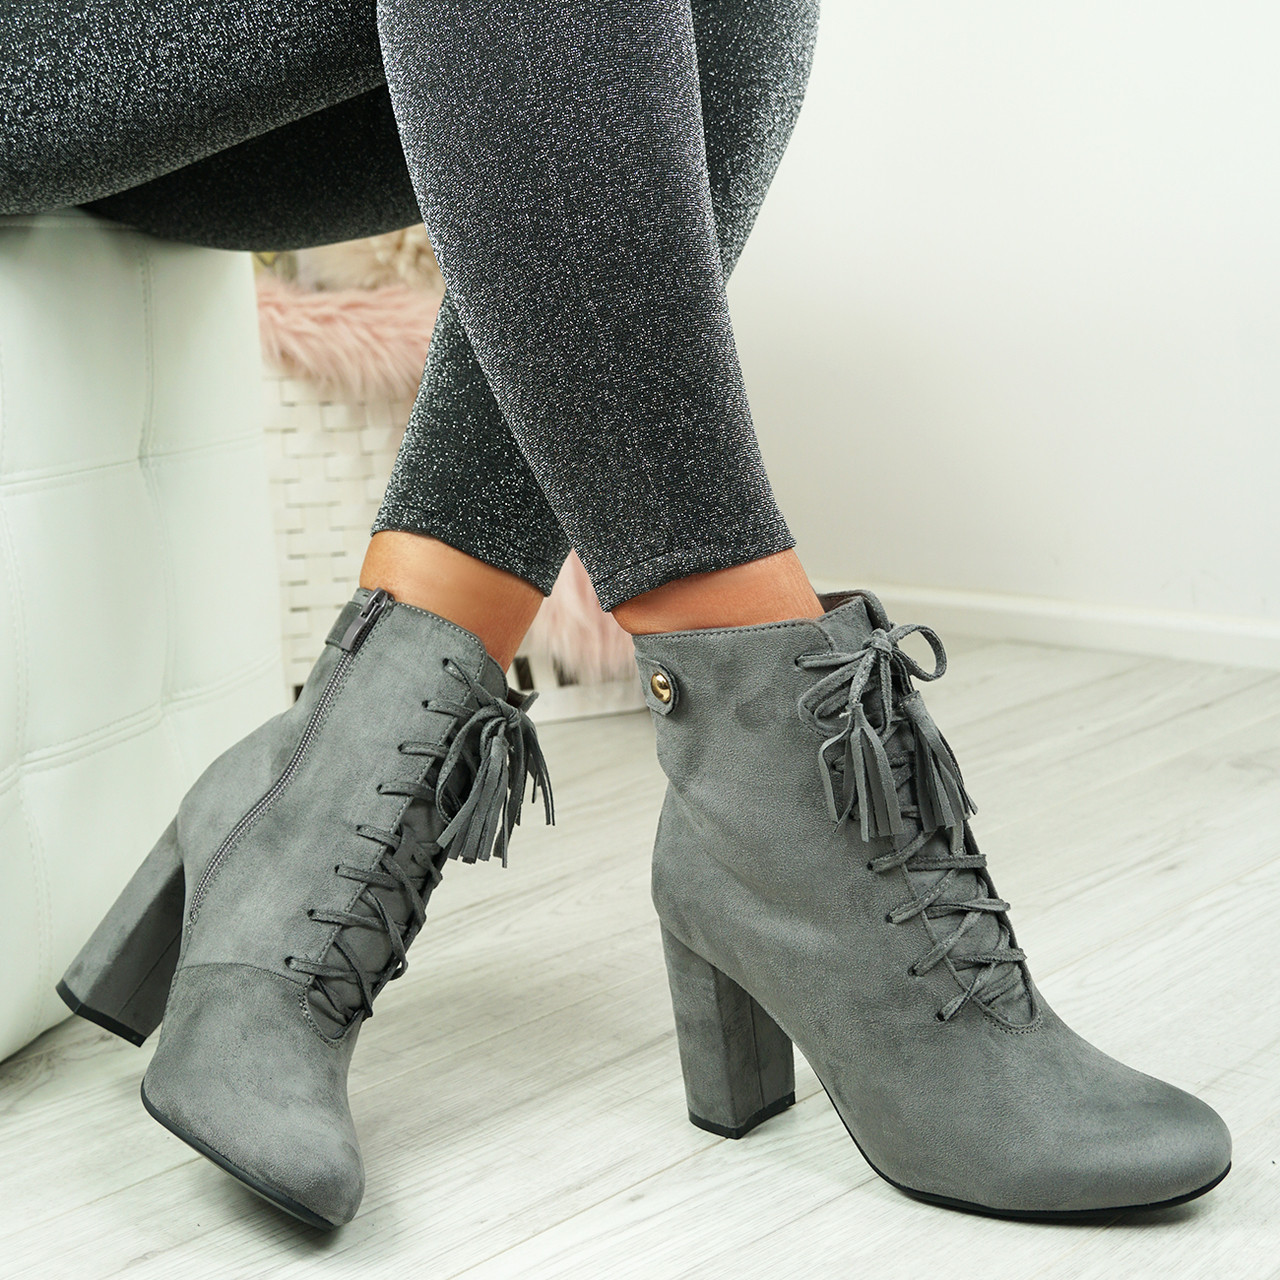 7420f0da4a1 Audrey Grey Block Heel Ankle Boots